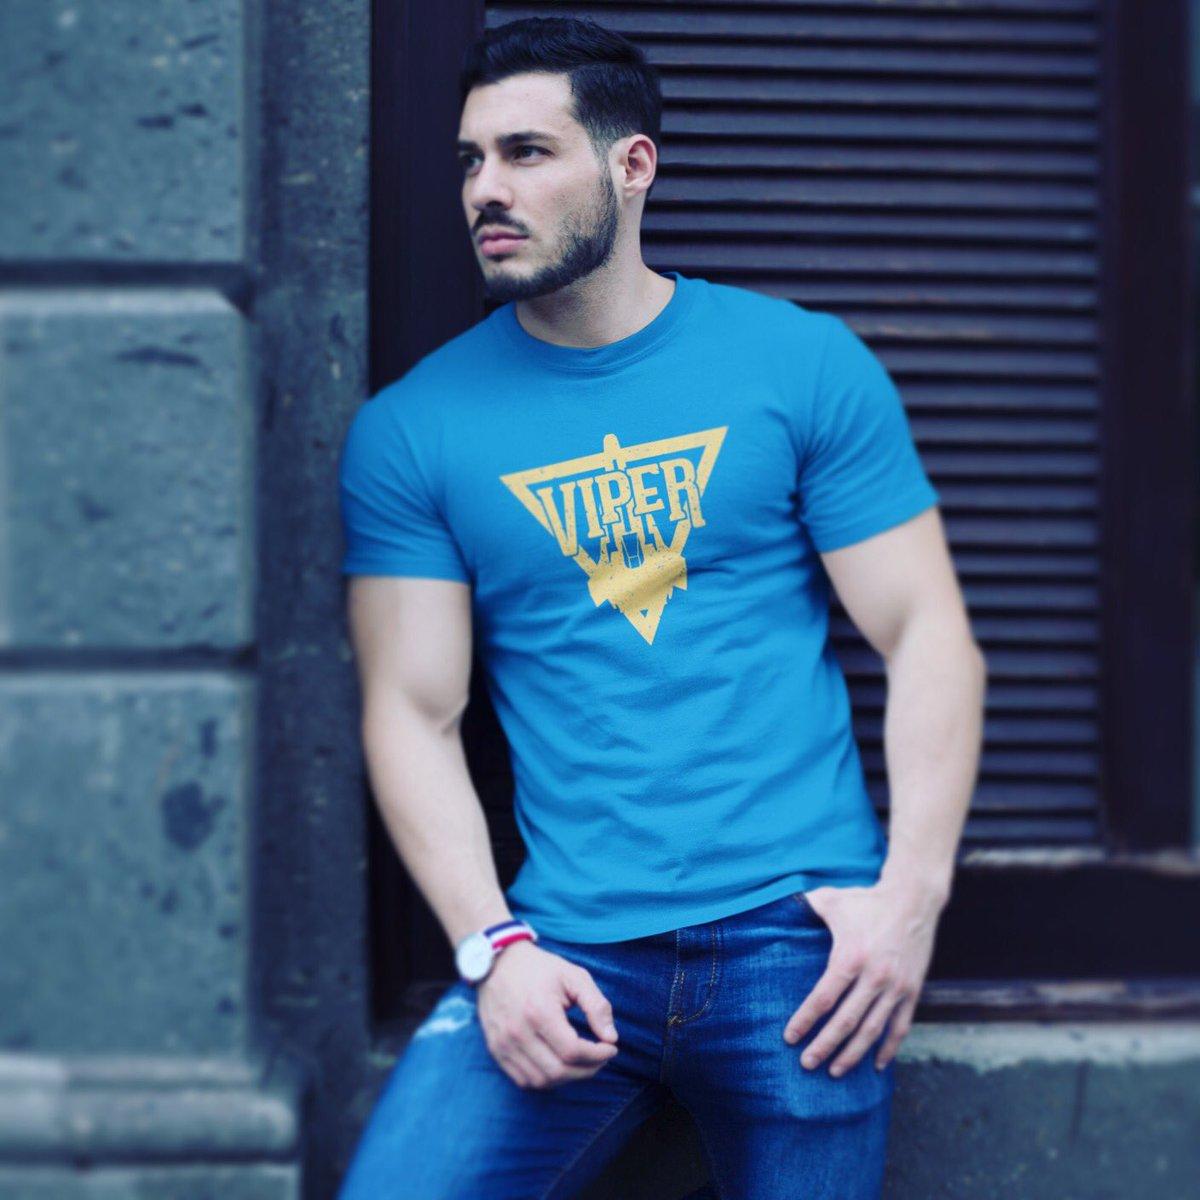 Gianni in our VIPER t-shirt. You too can be a Viper Pilot! #battlestargalactica get it: https://t.co/KqJPwI7yCI #battlestar #bsg #scifi #tshirt #photooftheday #instagood #fashion #nerd #cool #instafashionshion #cosplay #tshirtdesign #verybear #space #viper https://t.co/wpRTalI4Ik